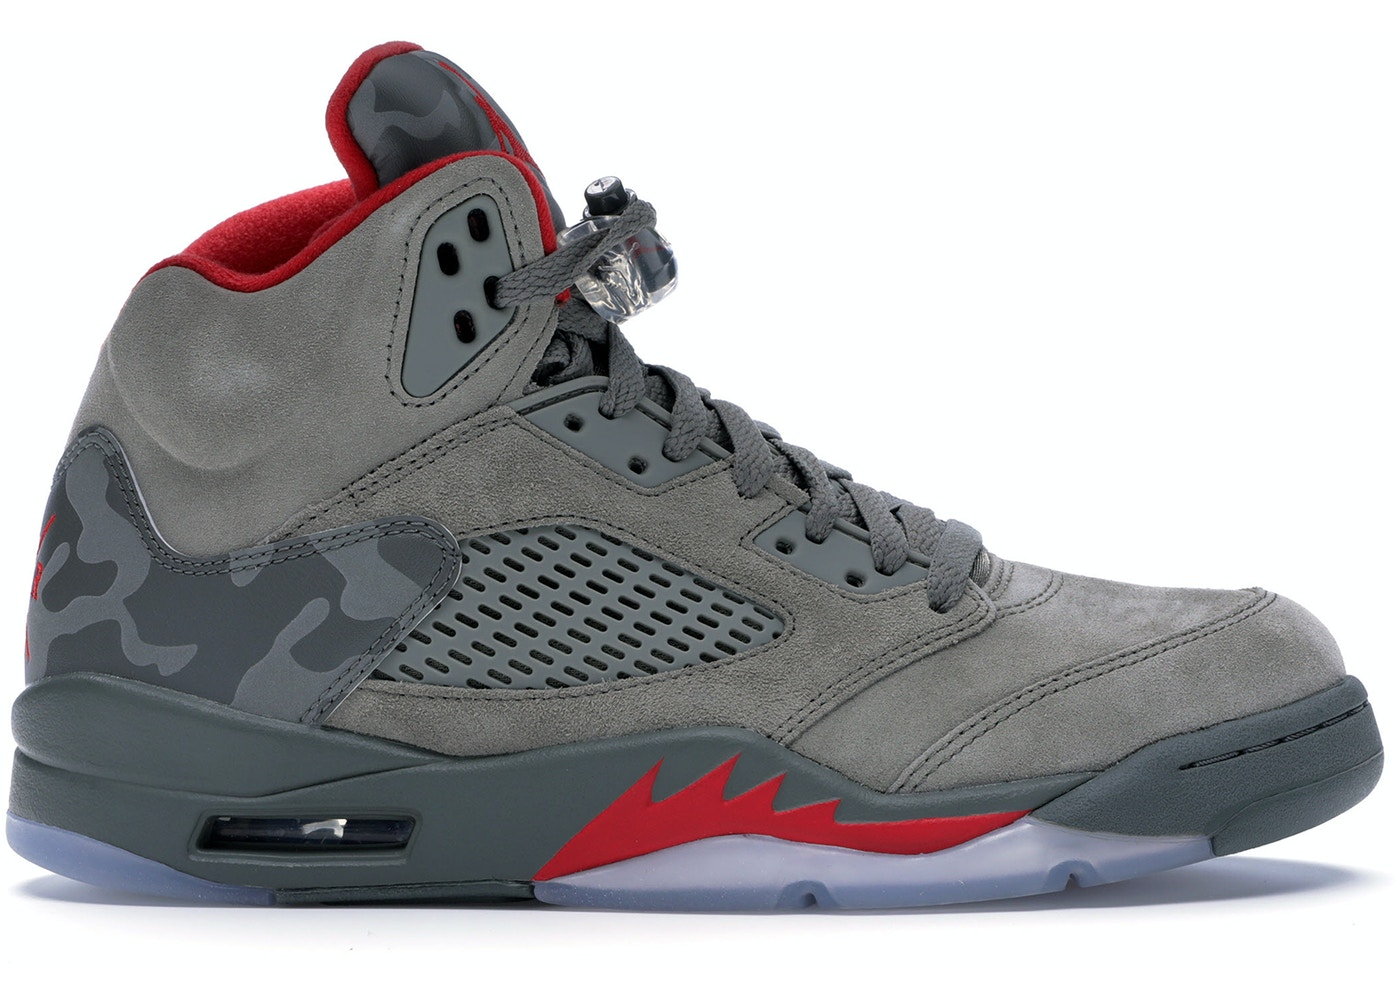 3adf6681 Air Jordan 5 Size 6 Shoes - Release Date